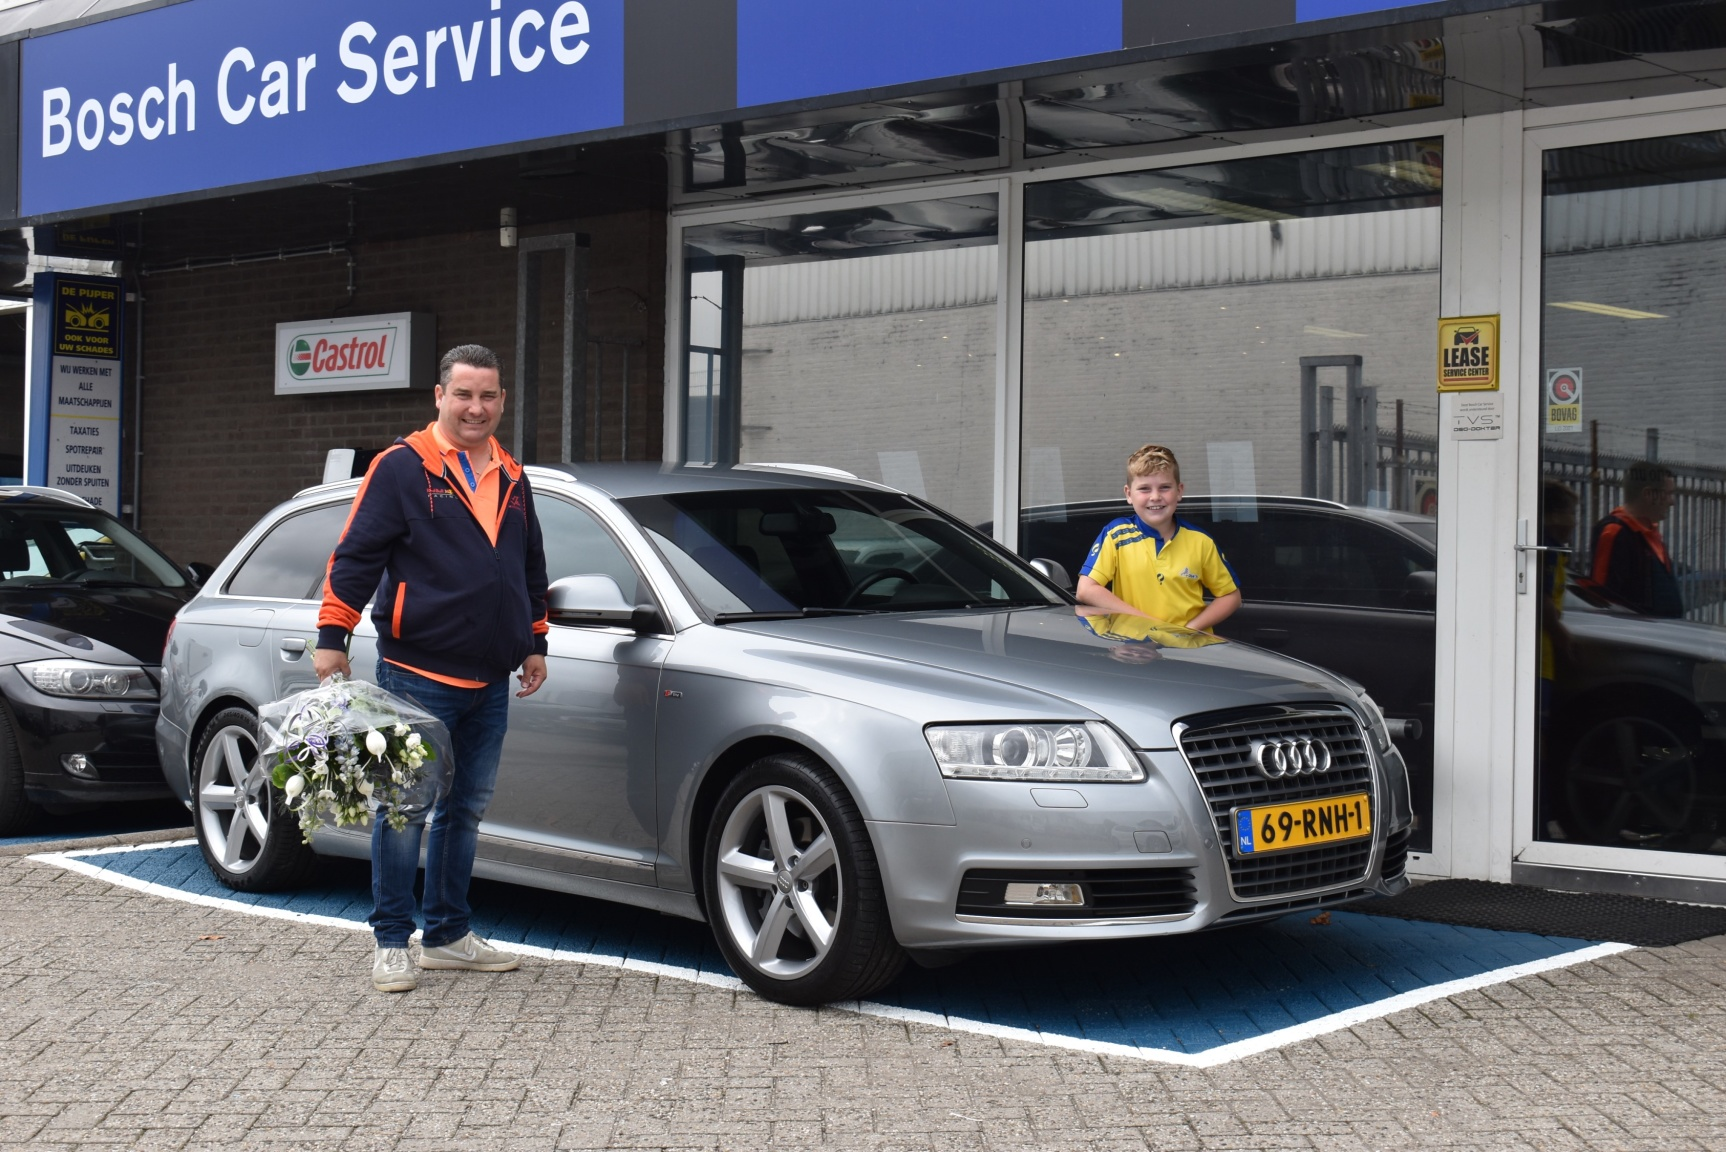 Aflevering Audi A6 Avant-2021-09-14 07:09:58